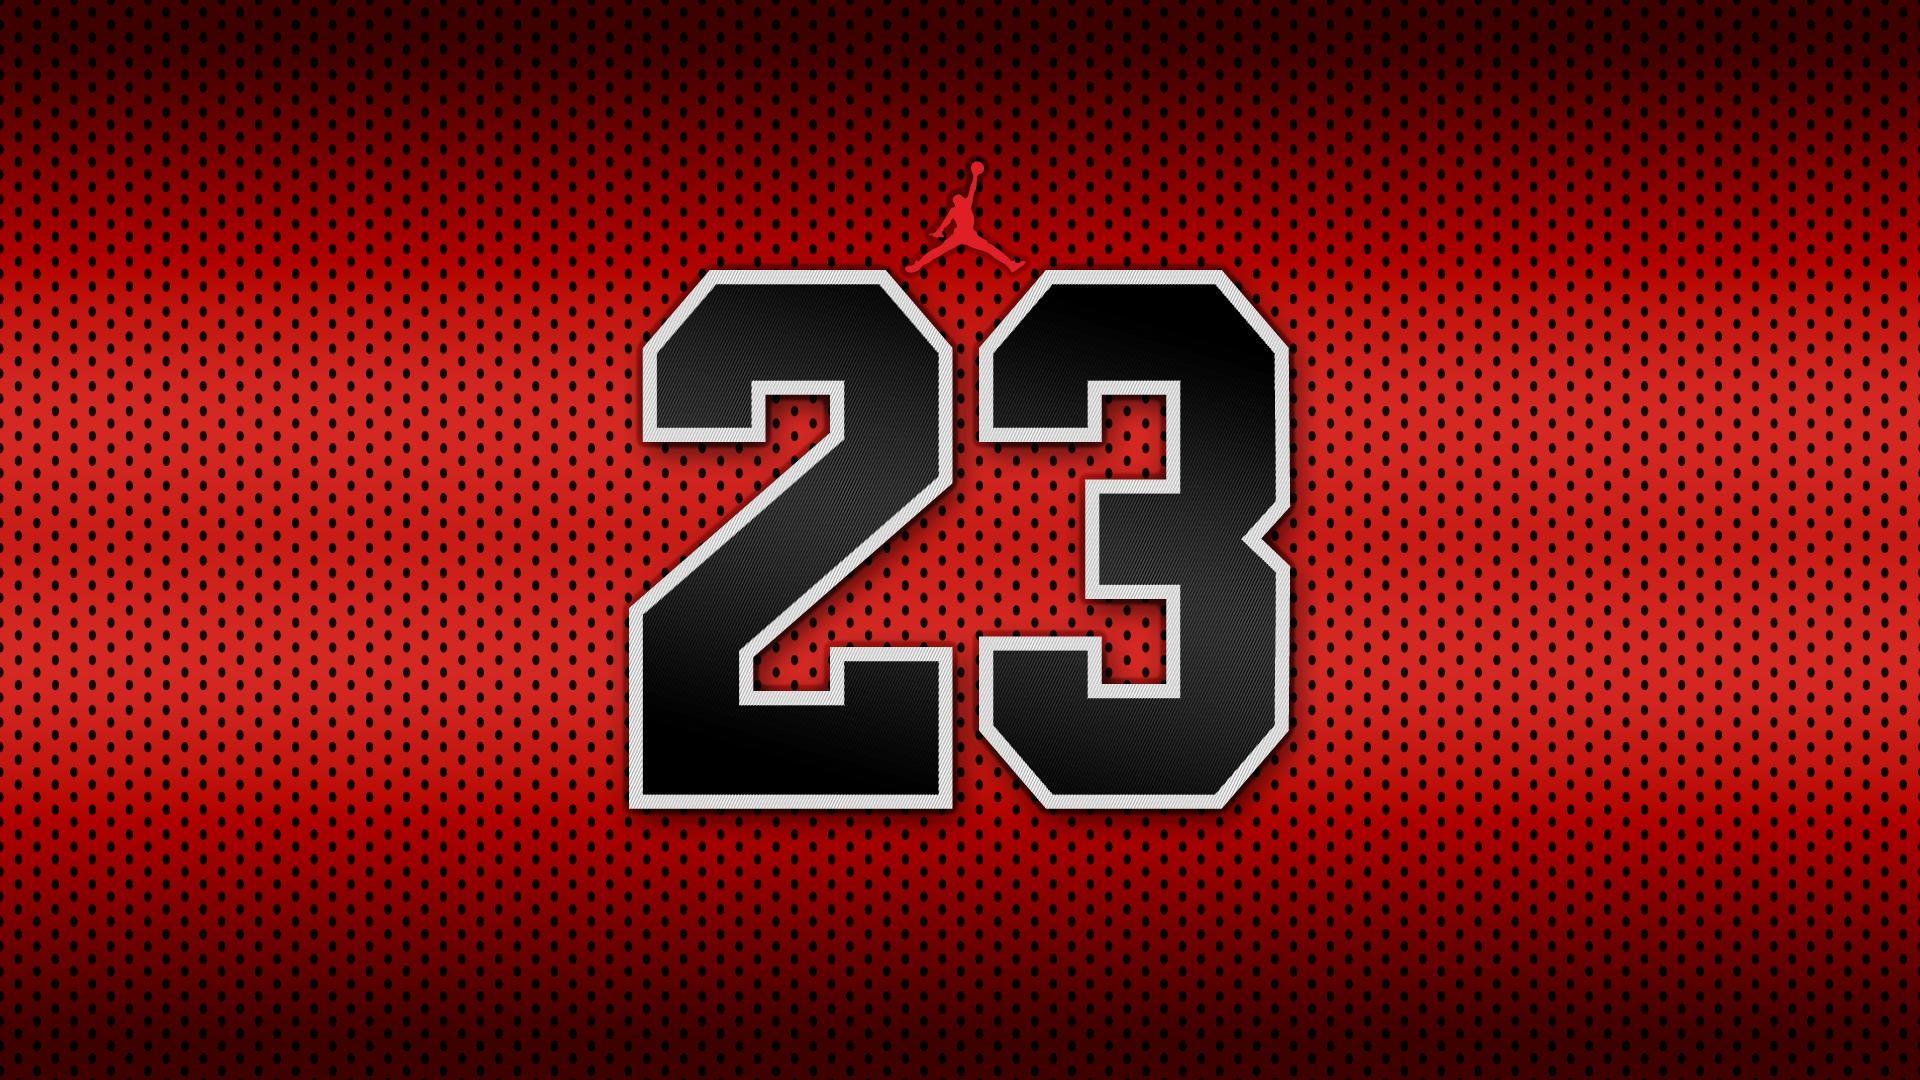 Michael-Jordan-Chicago-Bulls-HD-Background